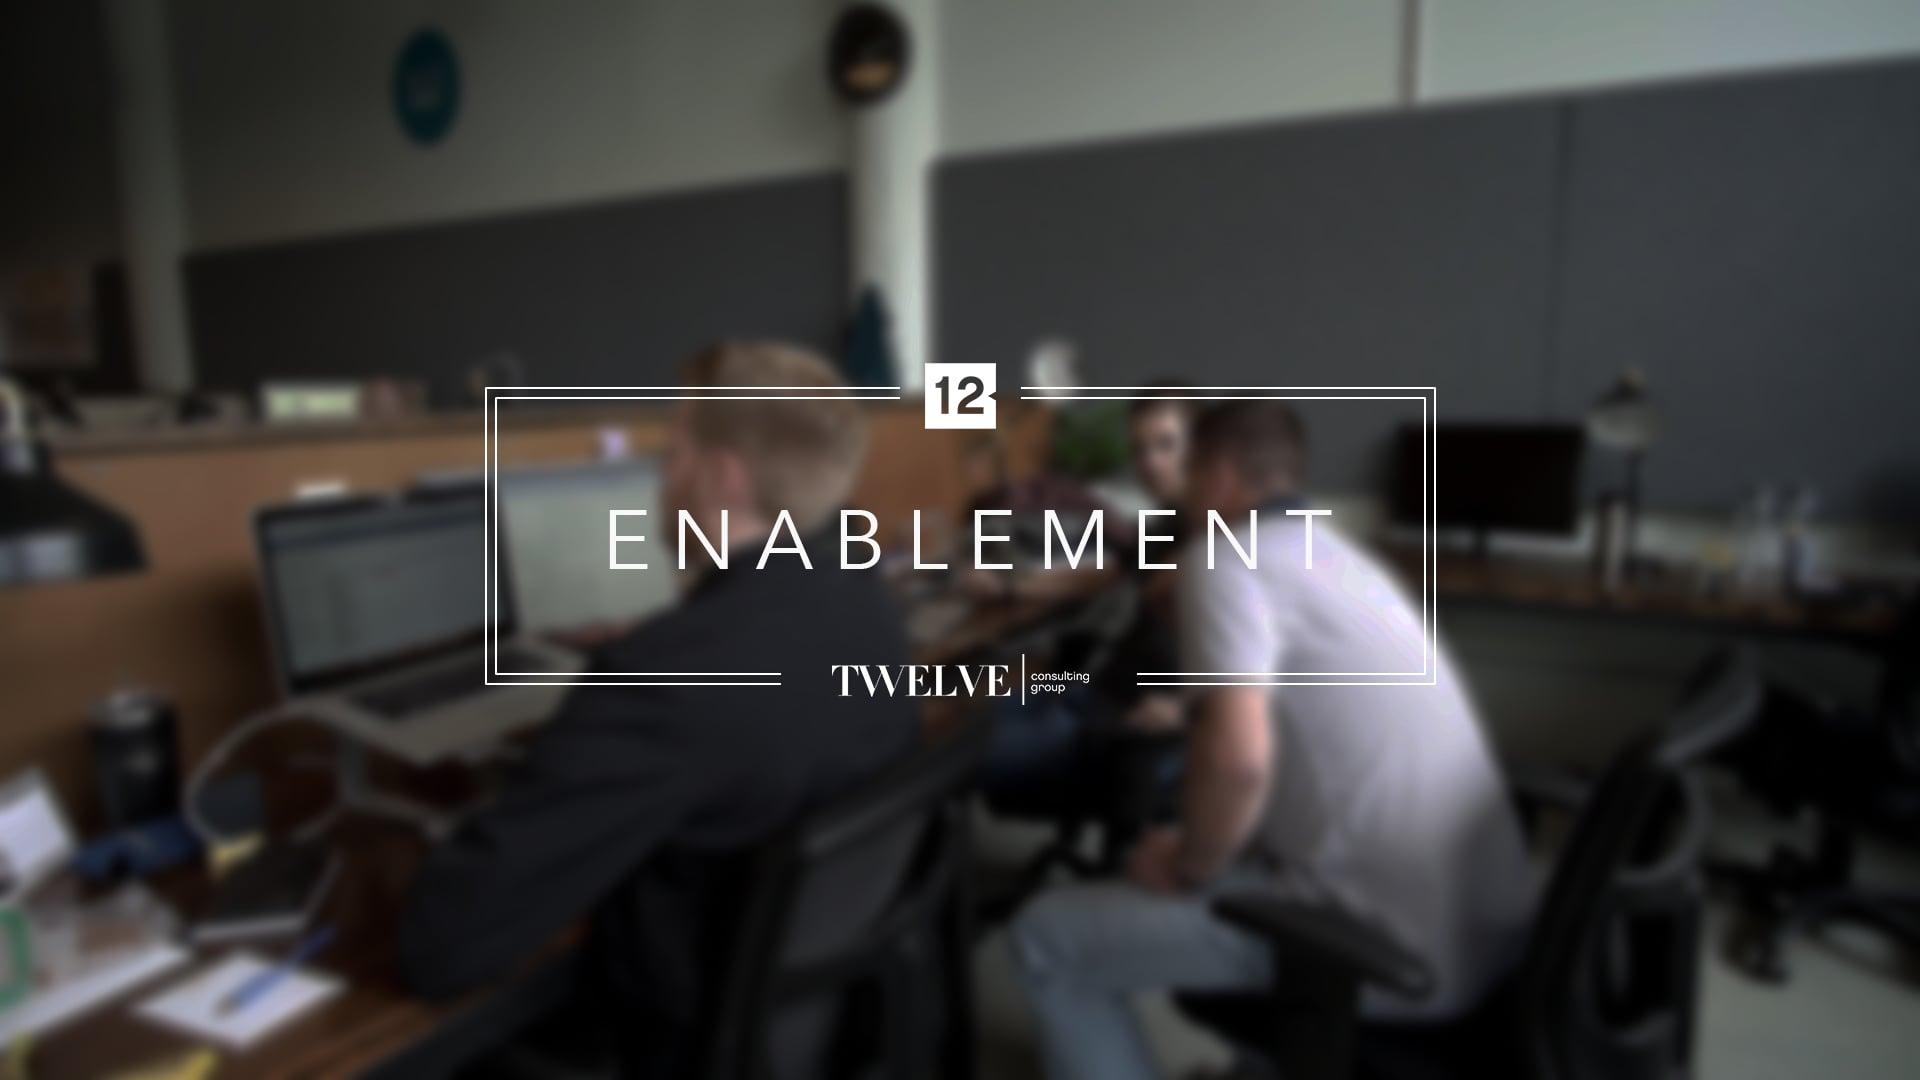 Enablement at Twelve